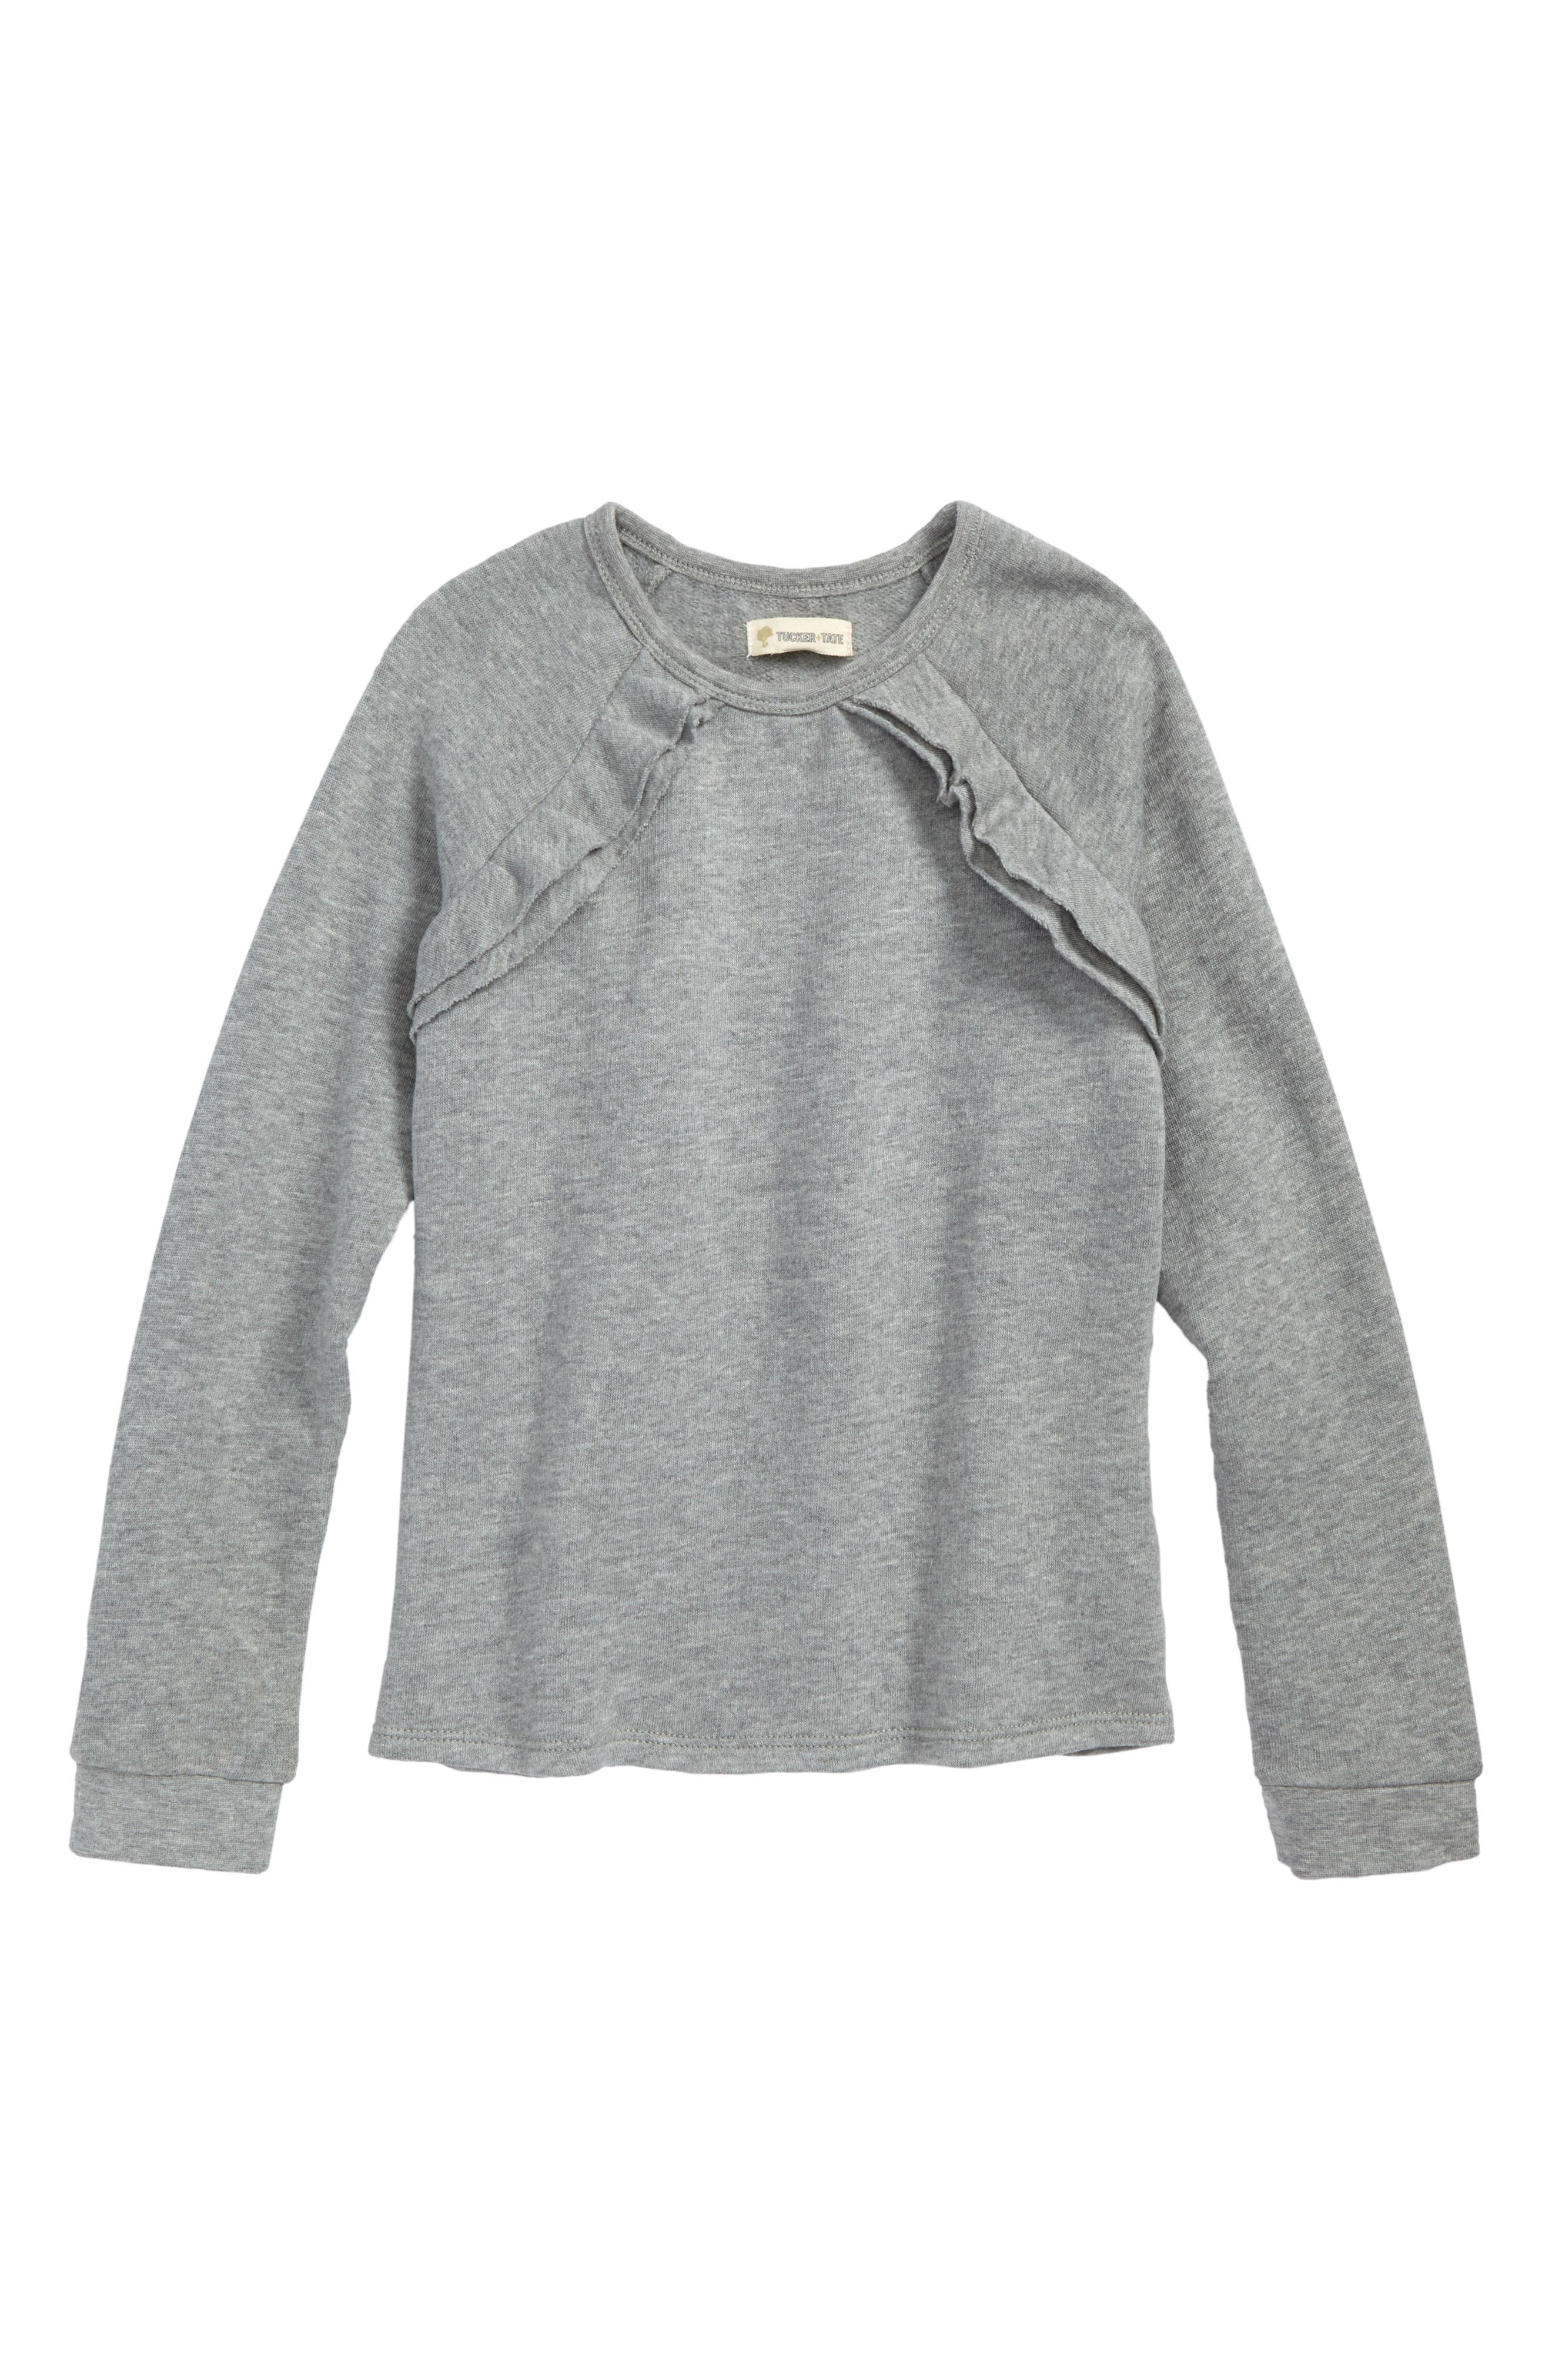 Tucker + Tate Ruffle Fleece Sweatshirt (Toddler Girls, Little Girls & Big Girls)